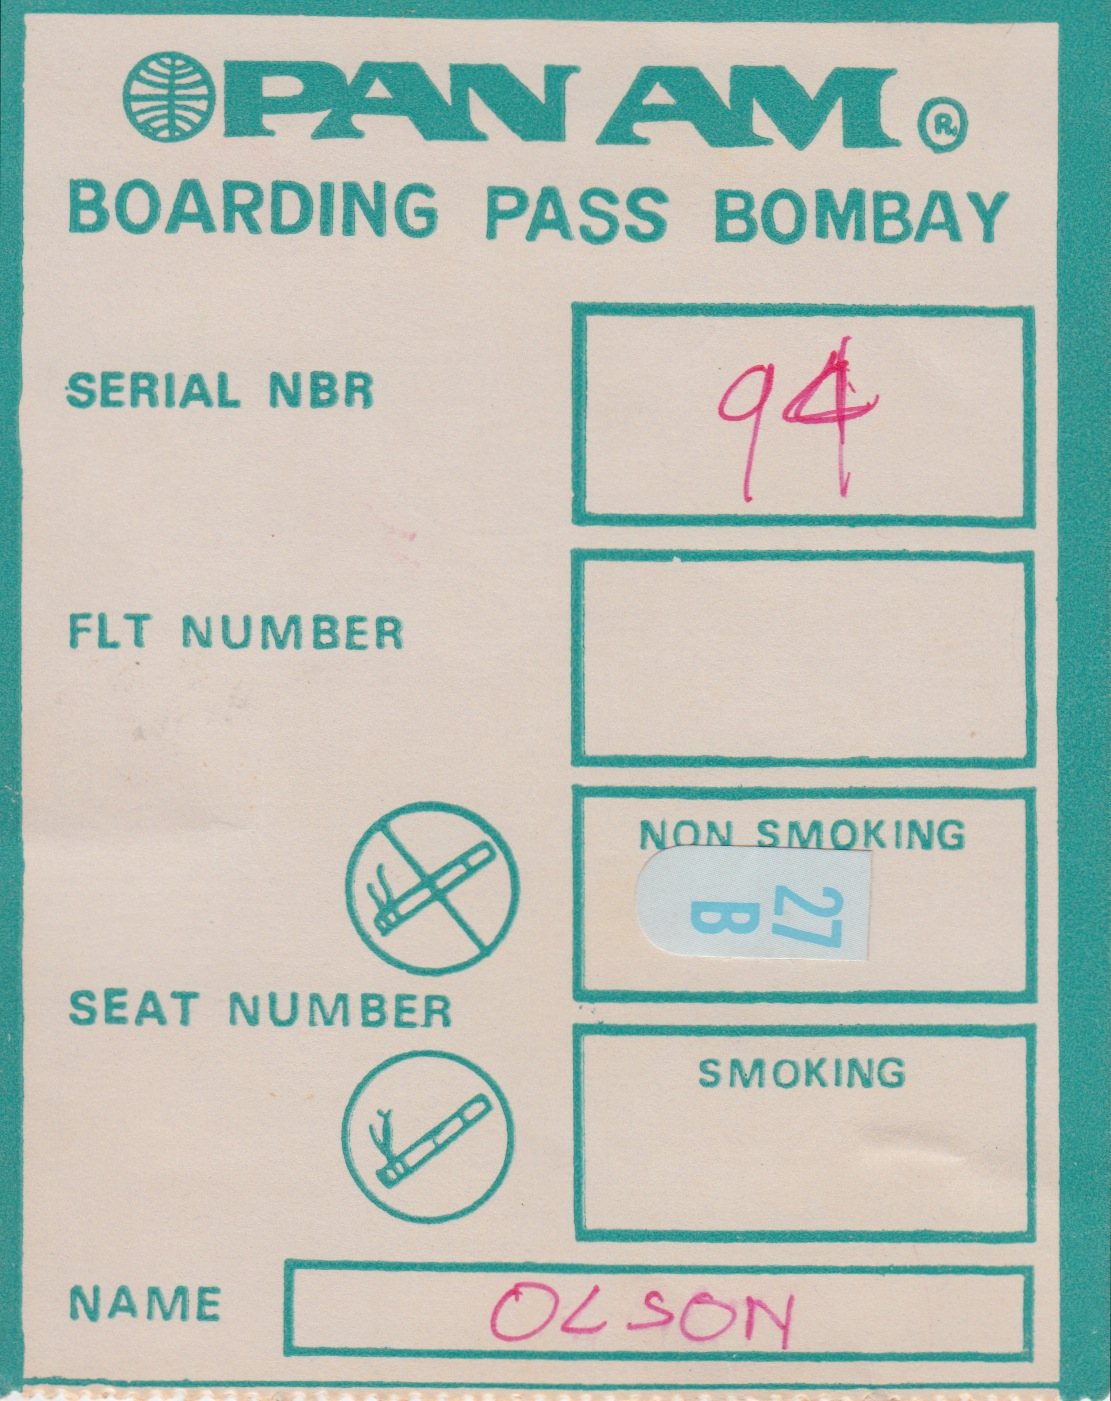 2 - boarding pass